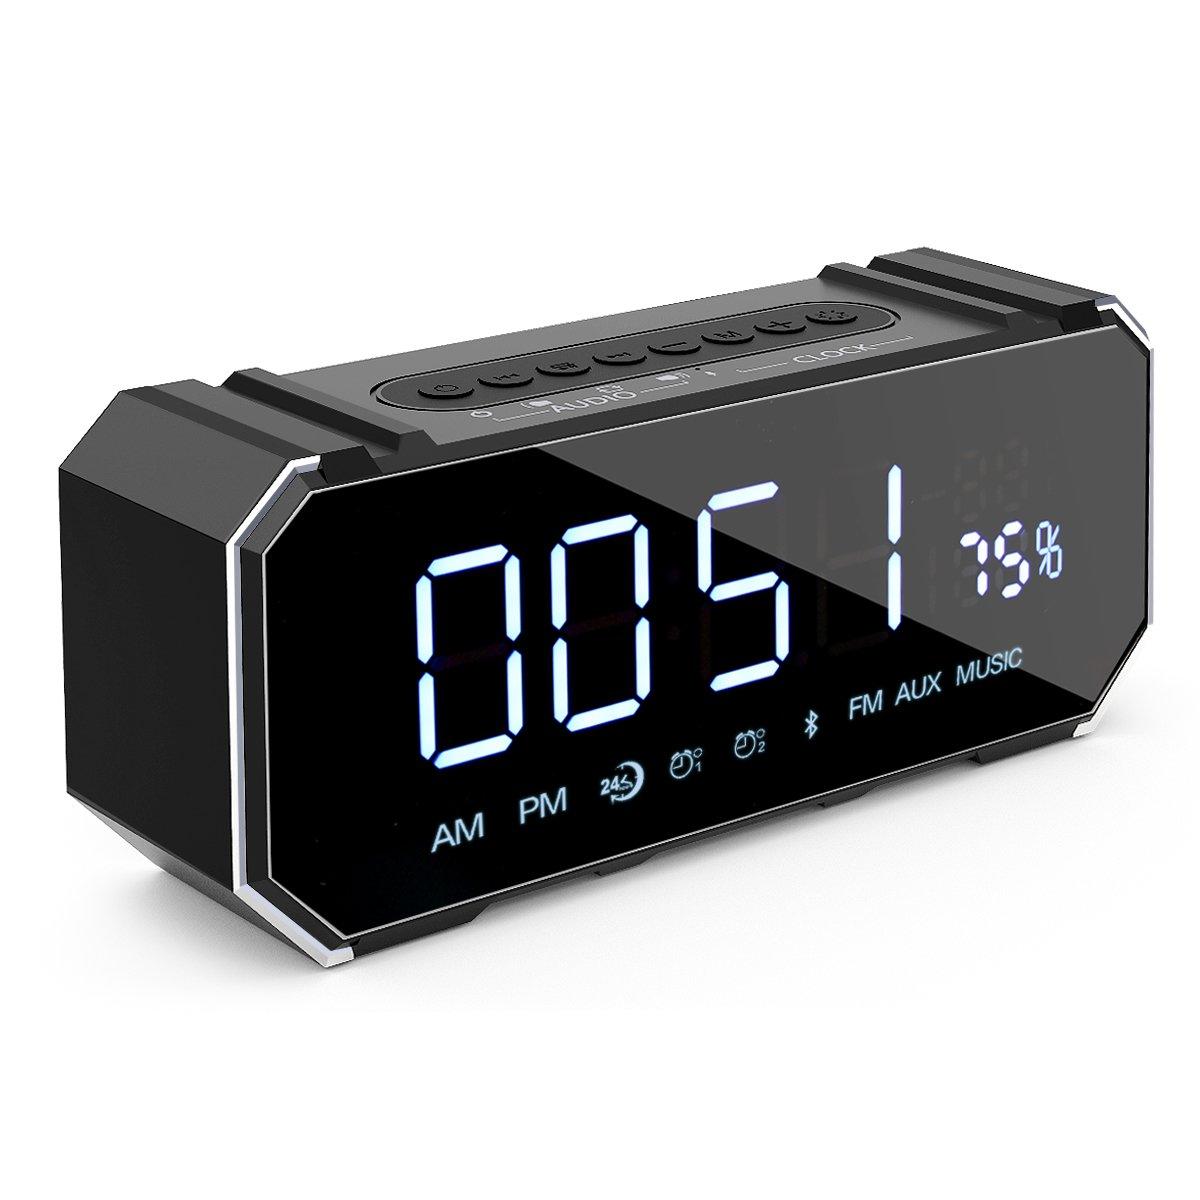 Cornmi Alarm Clock Radio, Dual Alarm Clock Bluetooth Speaker with FM Radio, LED Dimmable Mirror Surface display for Bedroom, Kitchen, Hotel, Table, Desk (Black)